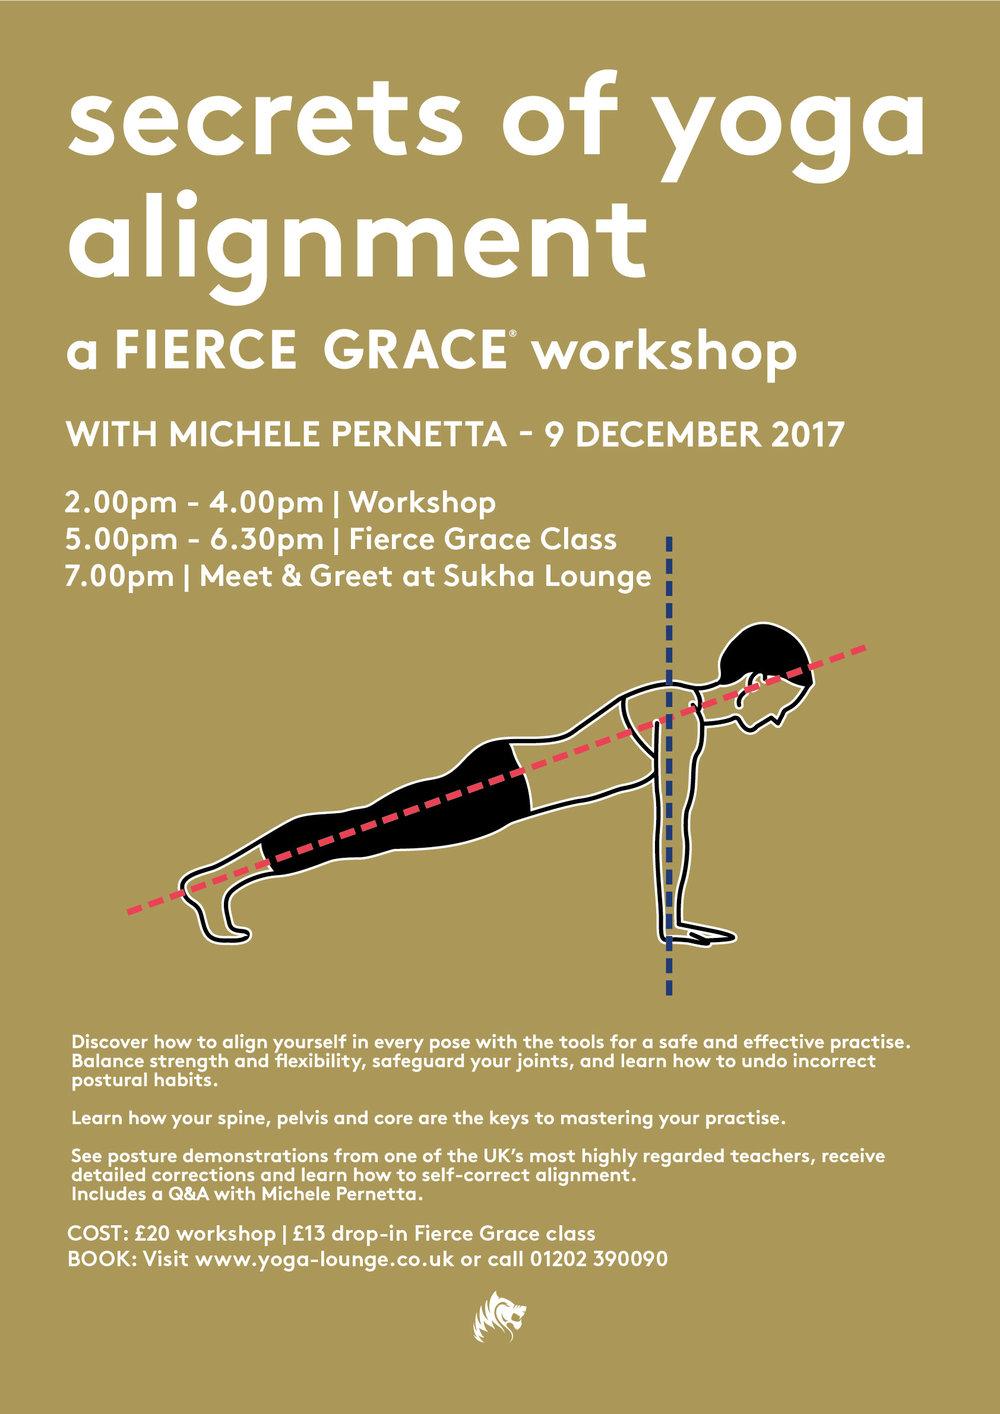 Alingment-Poster-FG-Bournemouth.jpg